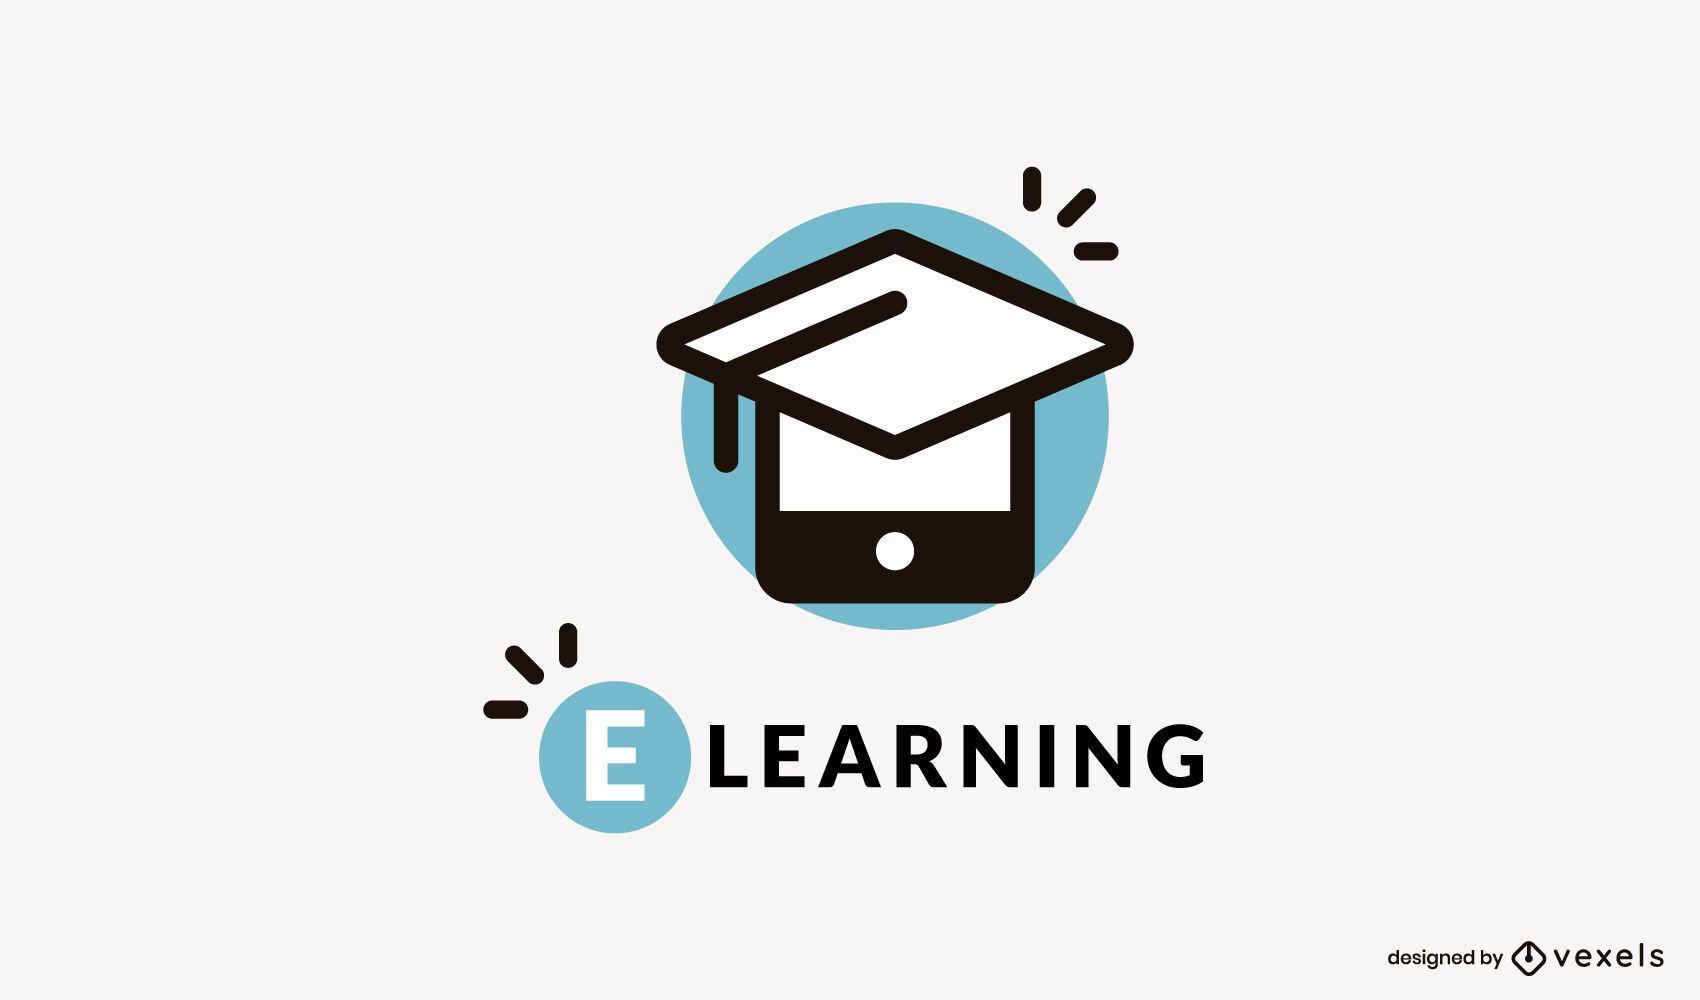 Diseño de logo de e learning